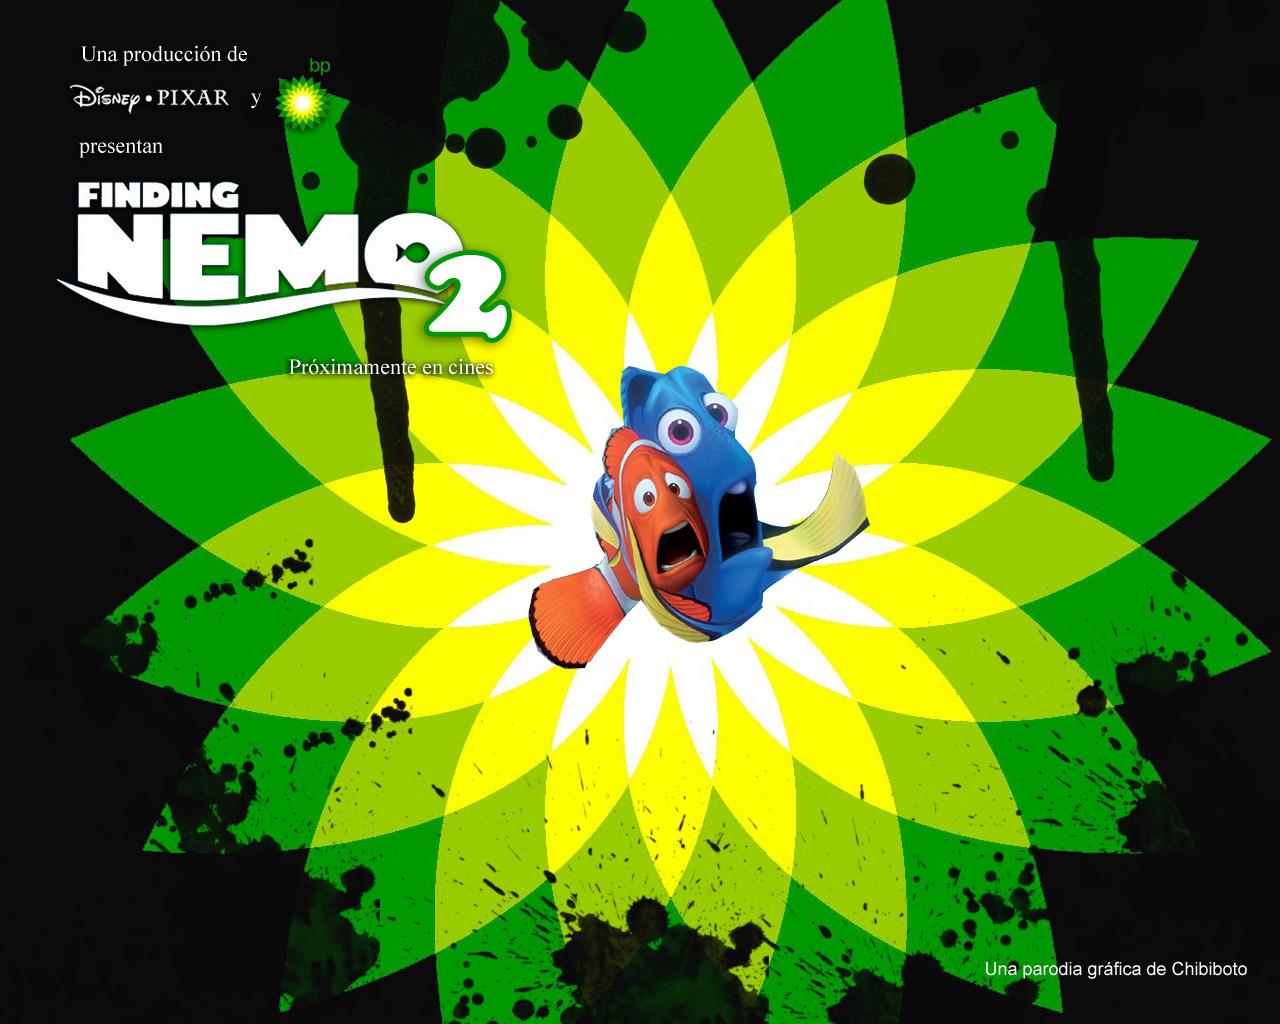 Le Monde de Nemo [Pixar - 2003] - Page 3 Wallpaperfindingnemobp4